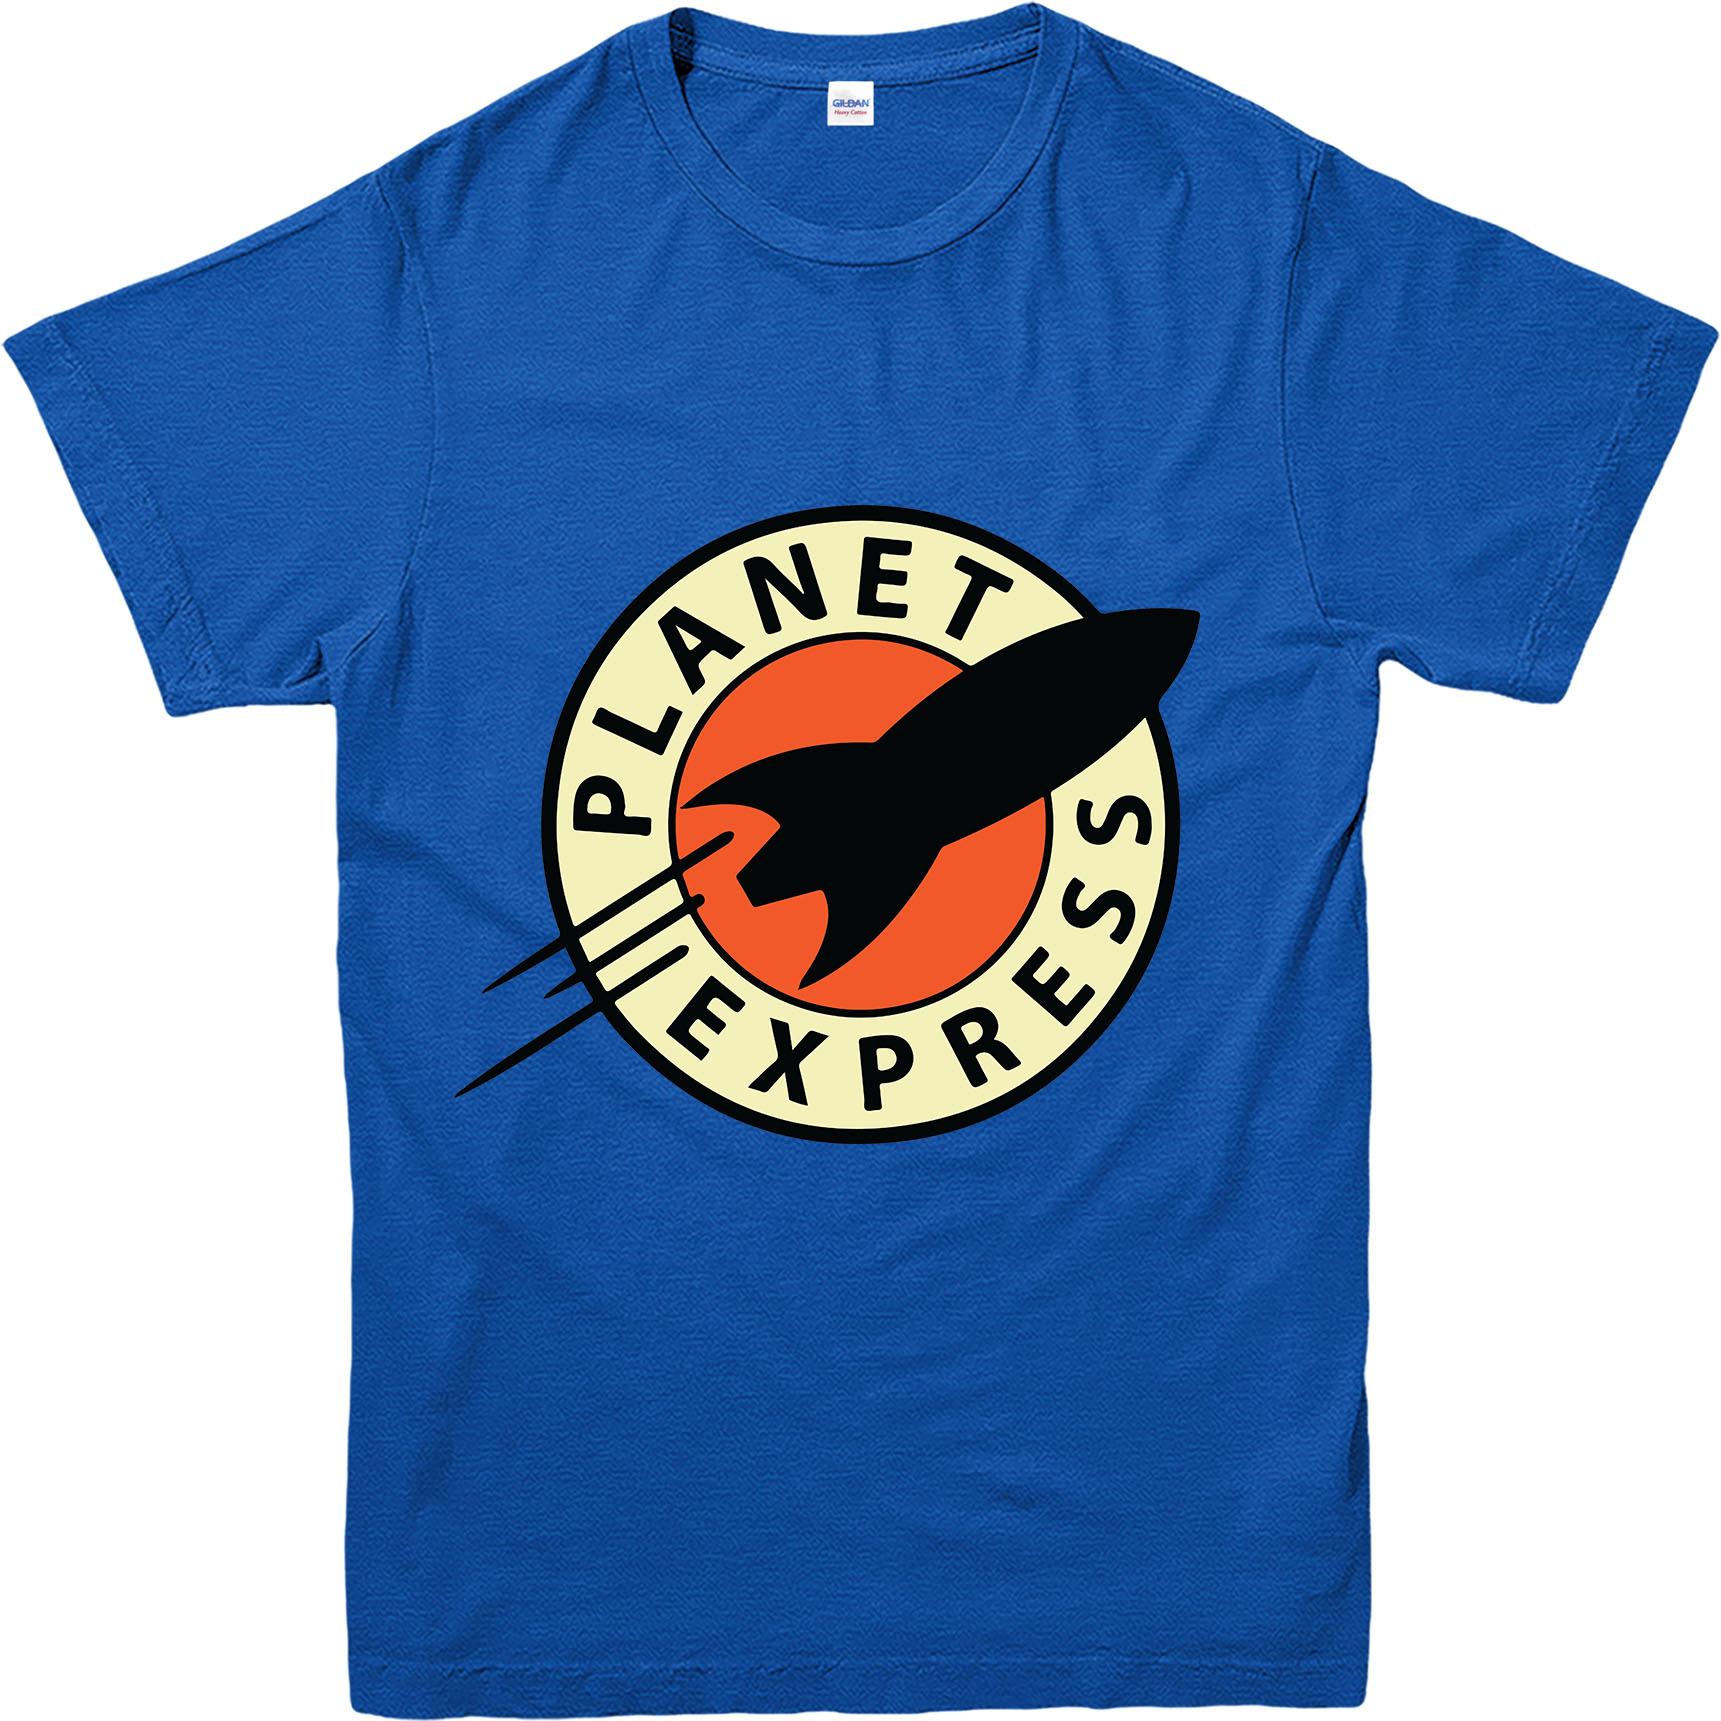 Black t shirt express - Black T Shirt Express Futurama T Shirt Planet Express T Shirt Inspired Design Top Summer